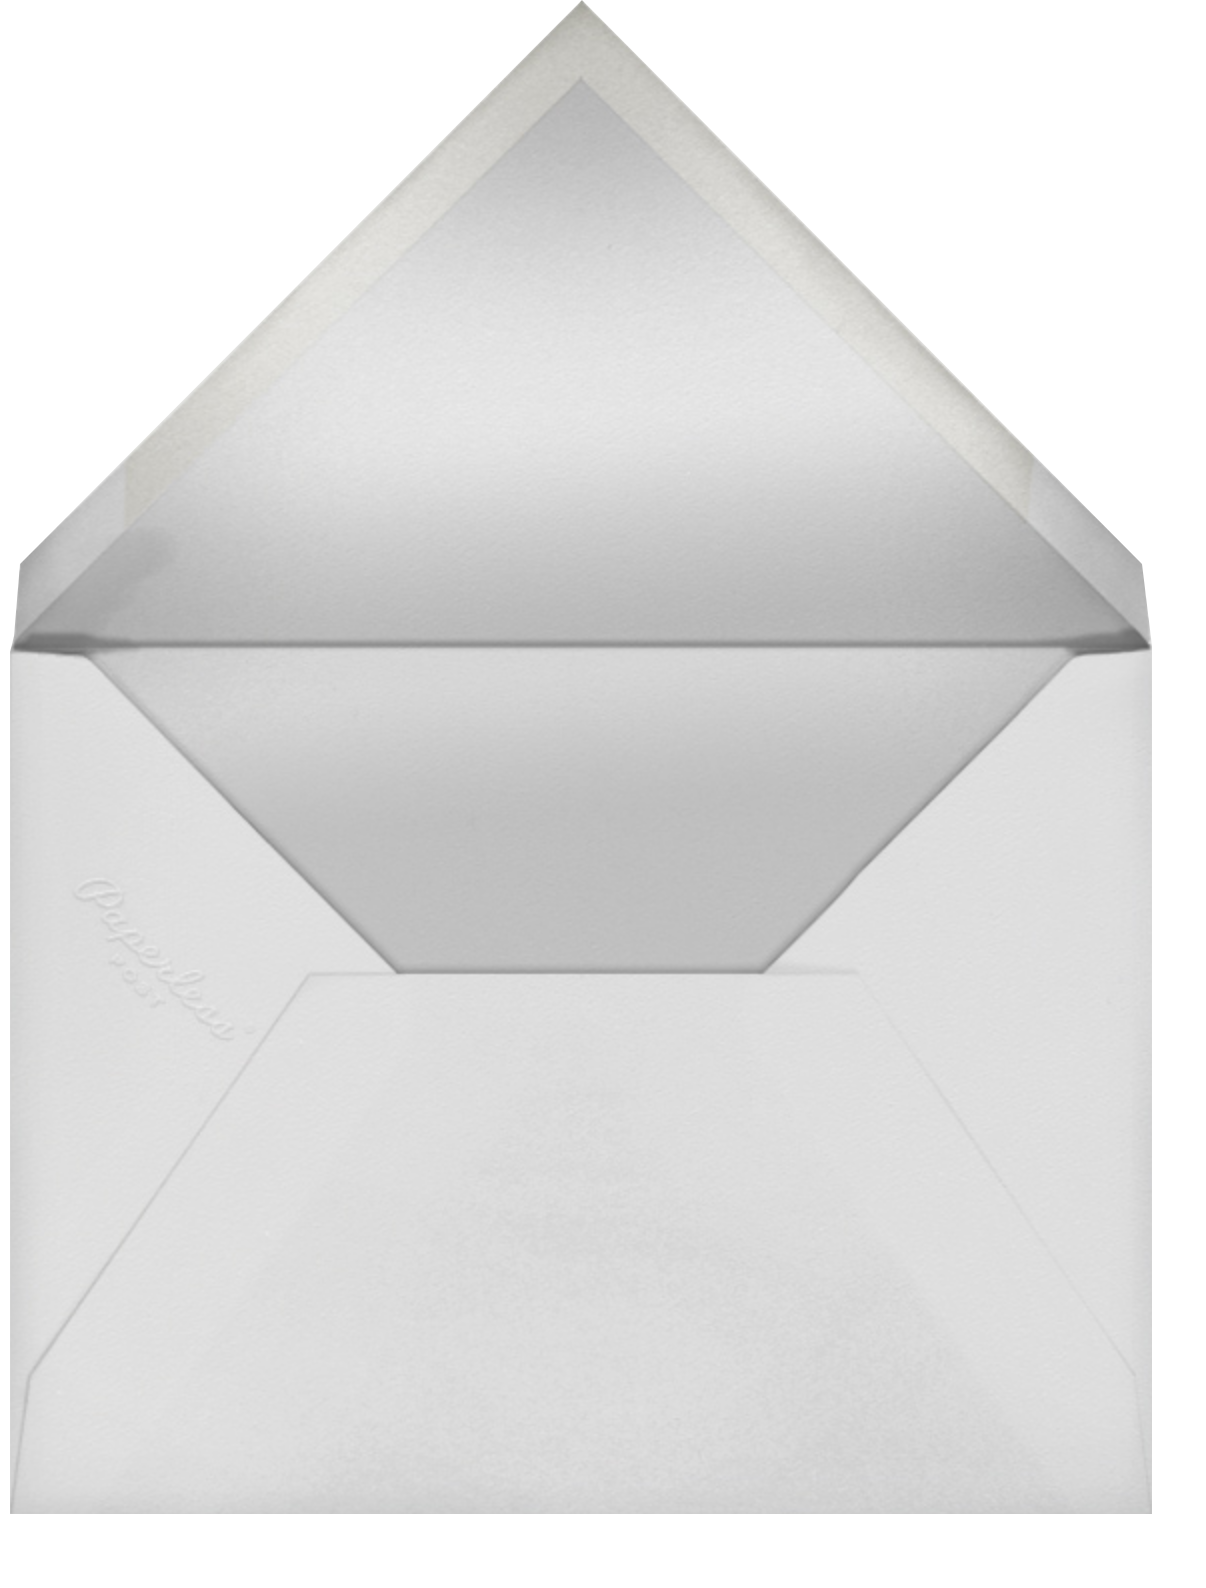 Heron Heralds (Menu) - Rifle Paper Co. - Menus - envelope back